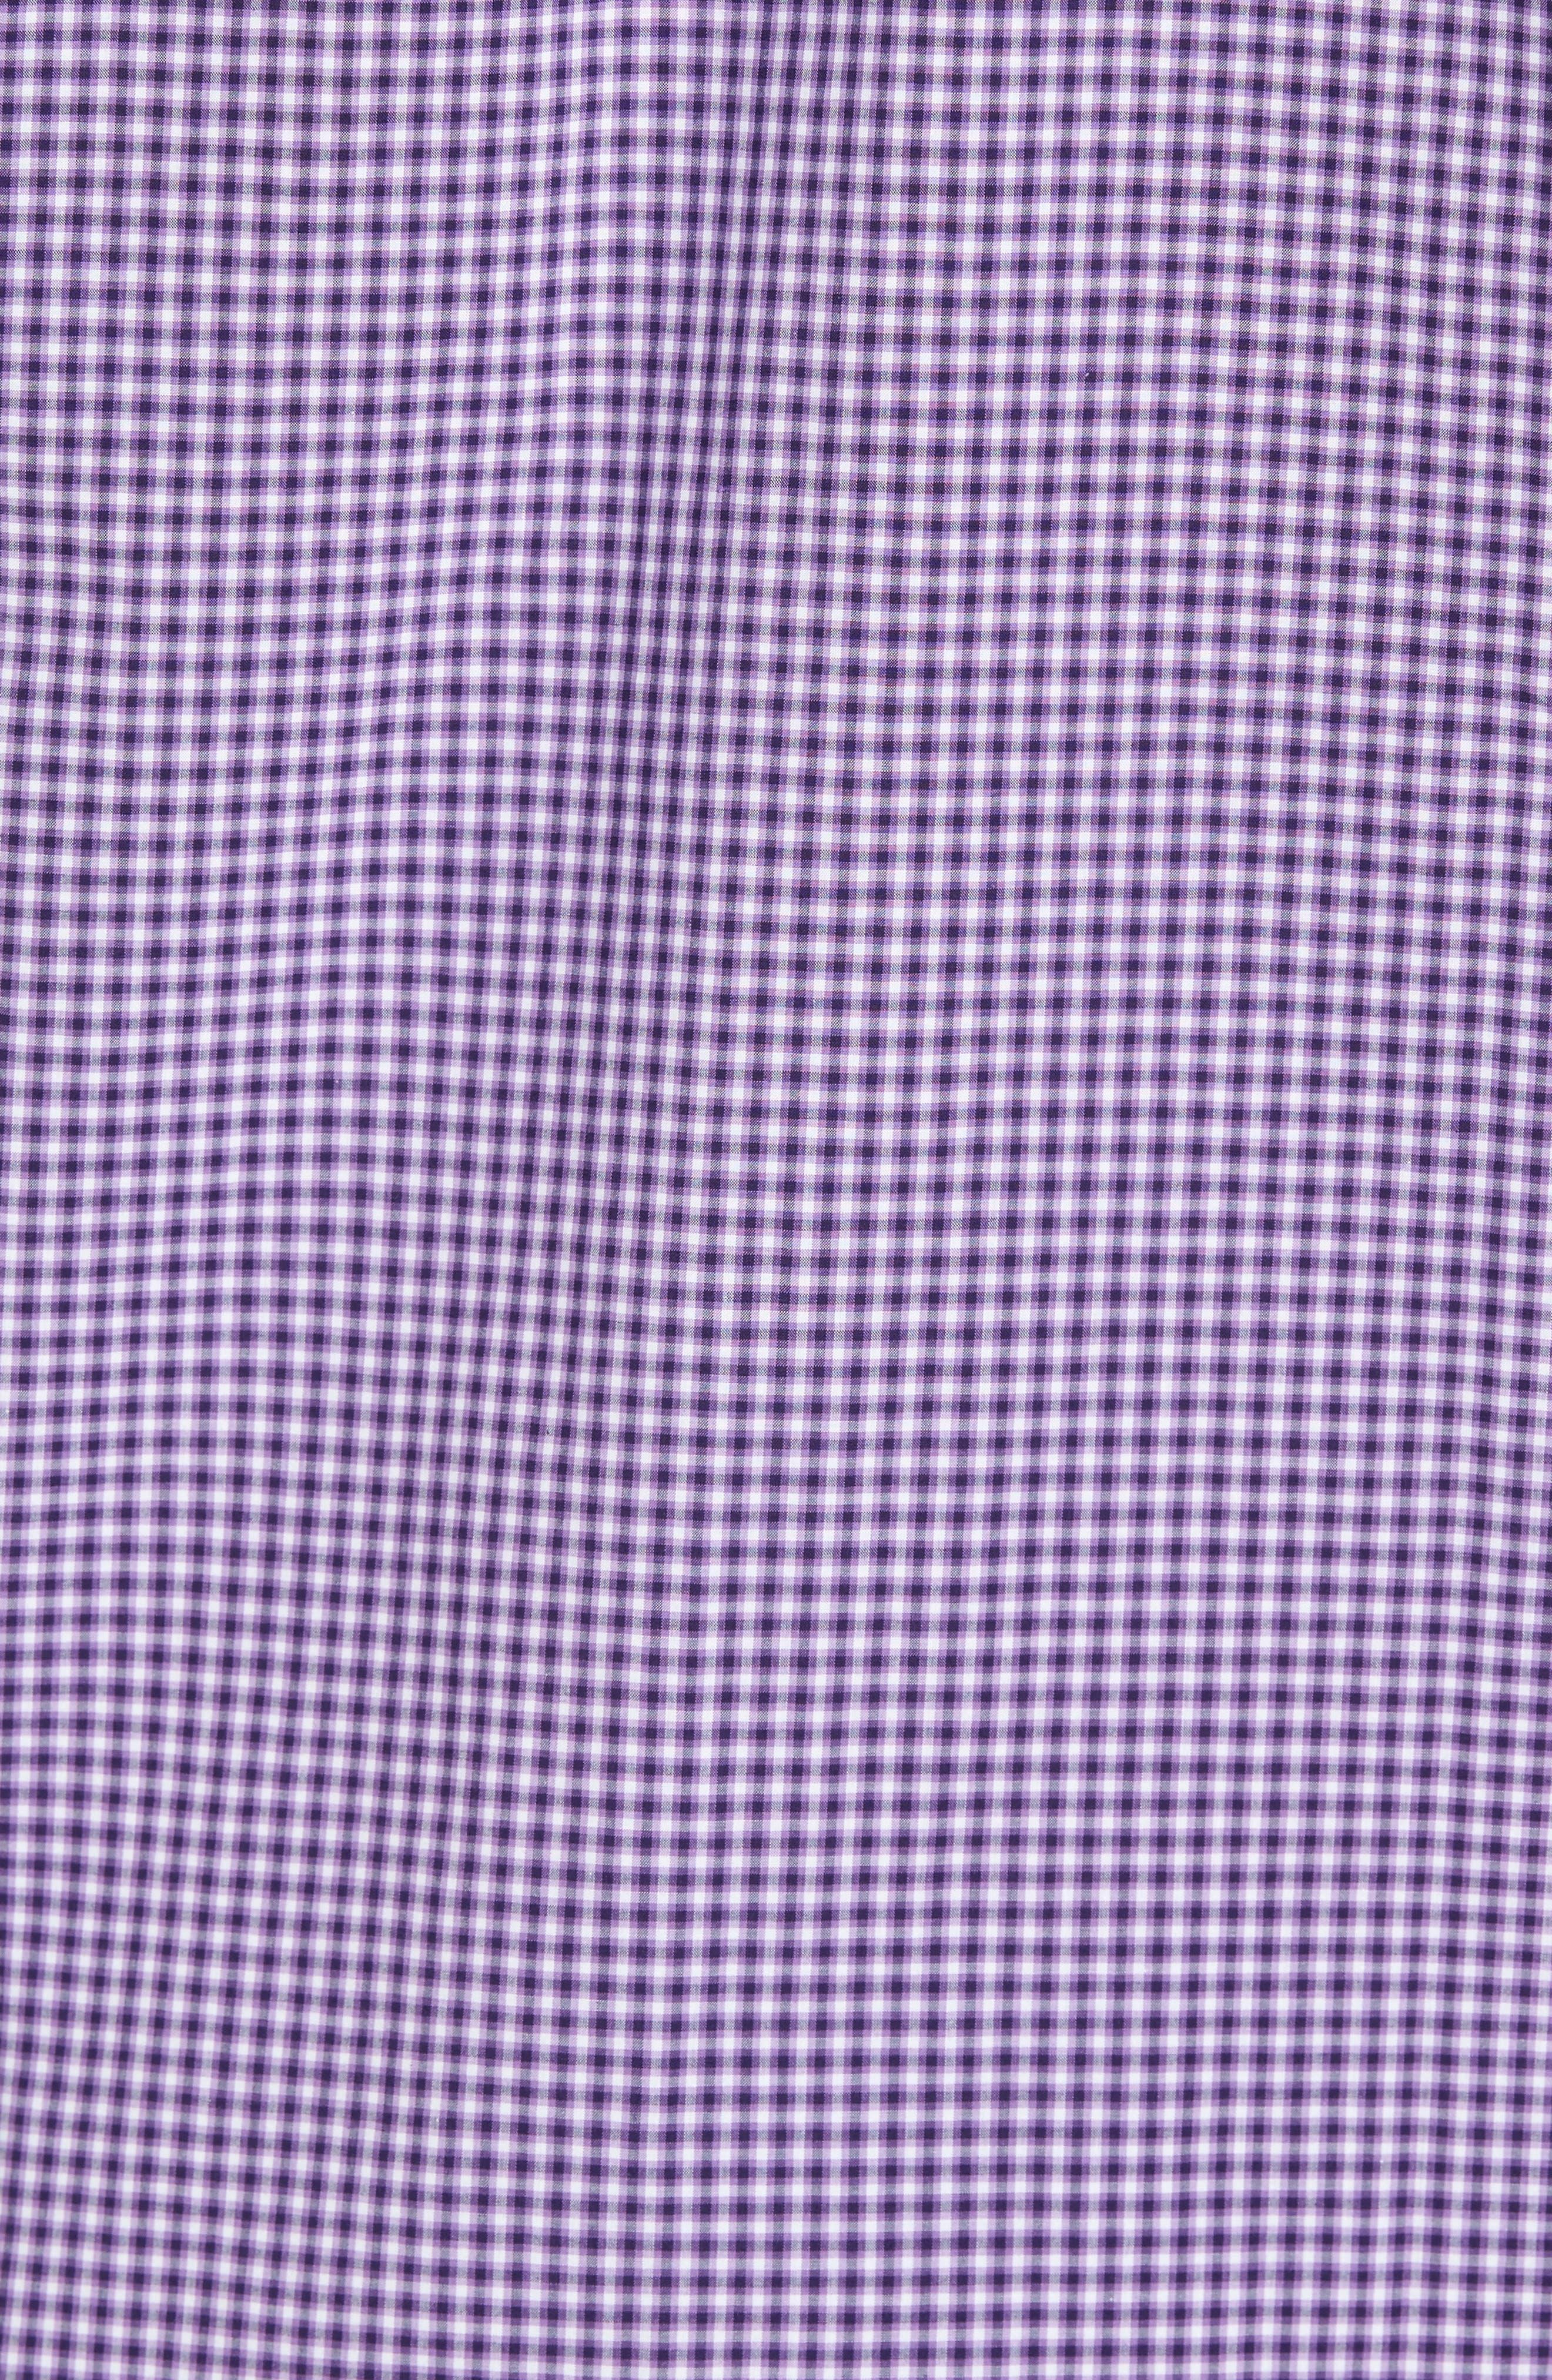 Pawlata Slim Fit Check Sport Shirt,                             Alternate thumbnail 5, color,                             500